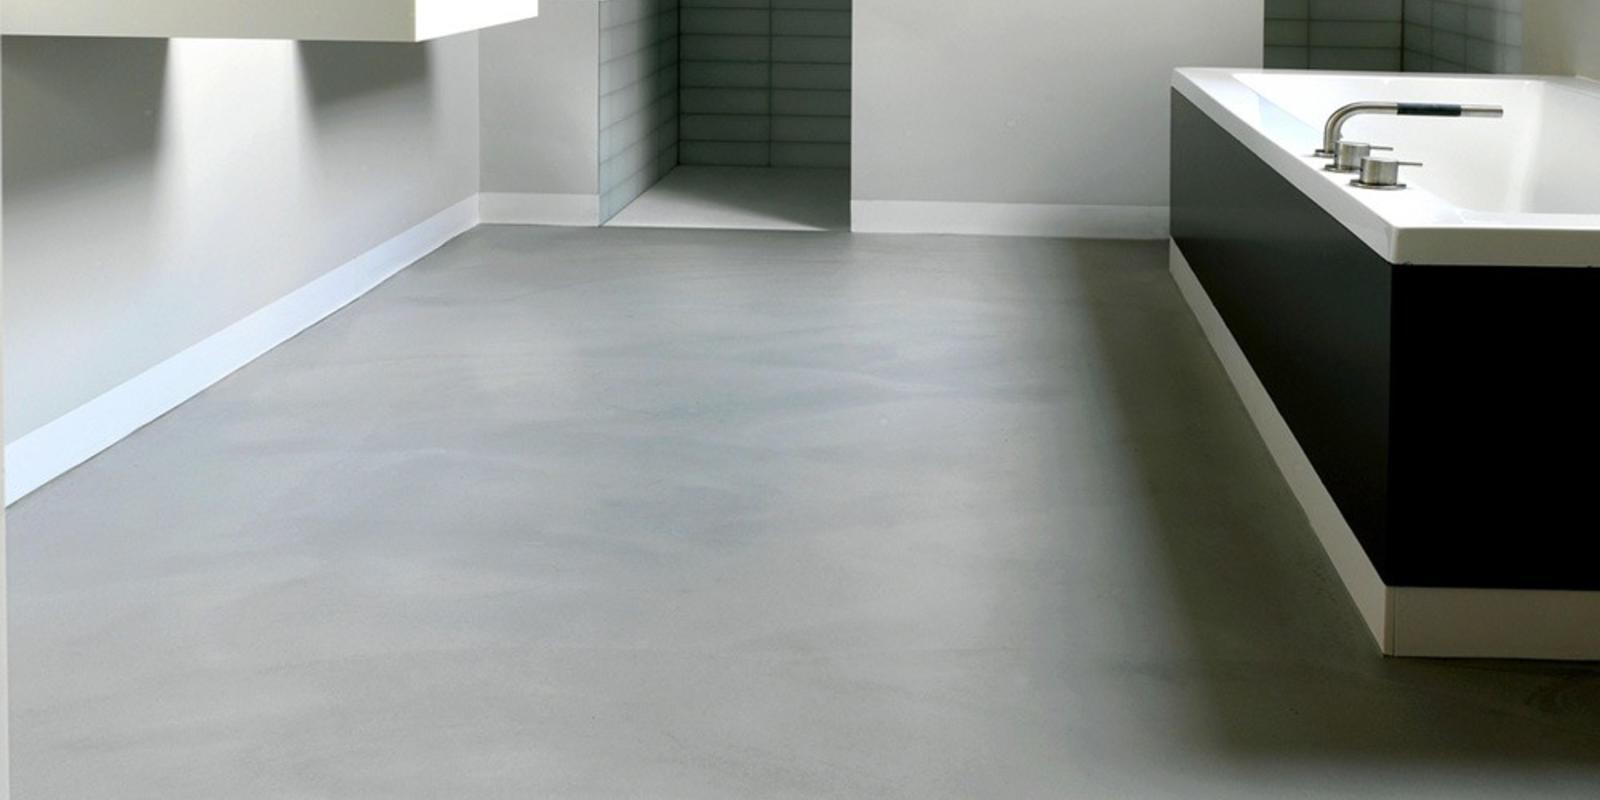 badkamer betonlook vloer